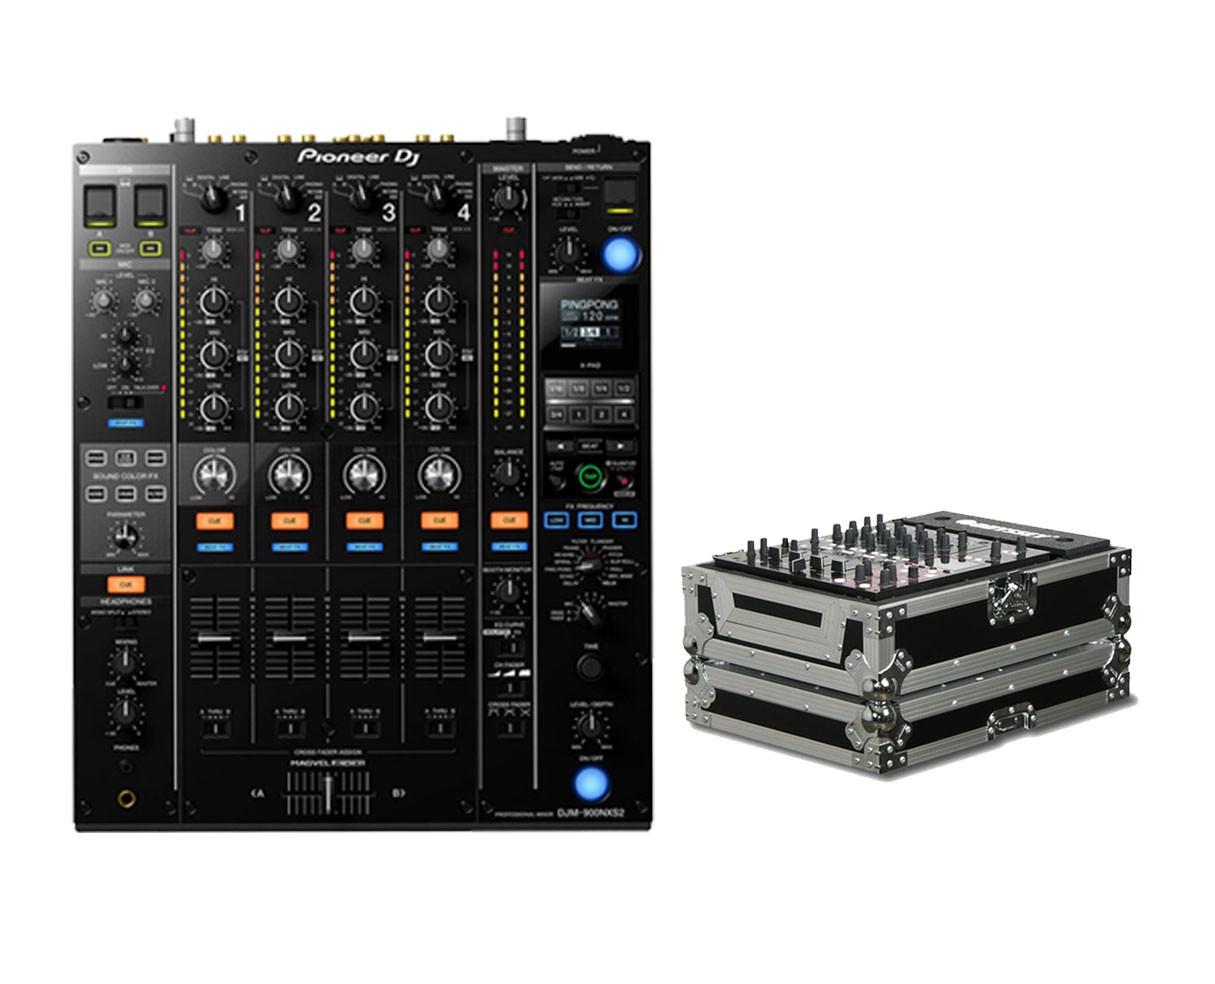 Pioneer DJM-900NXS2 + Odyssey Case